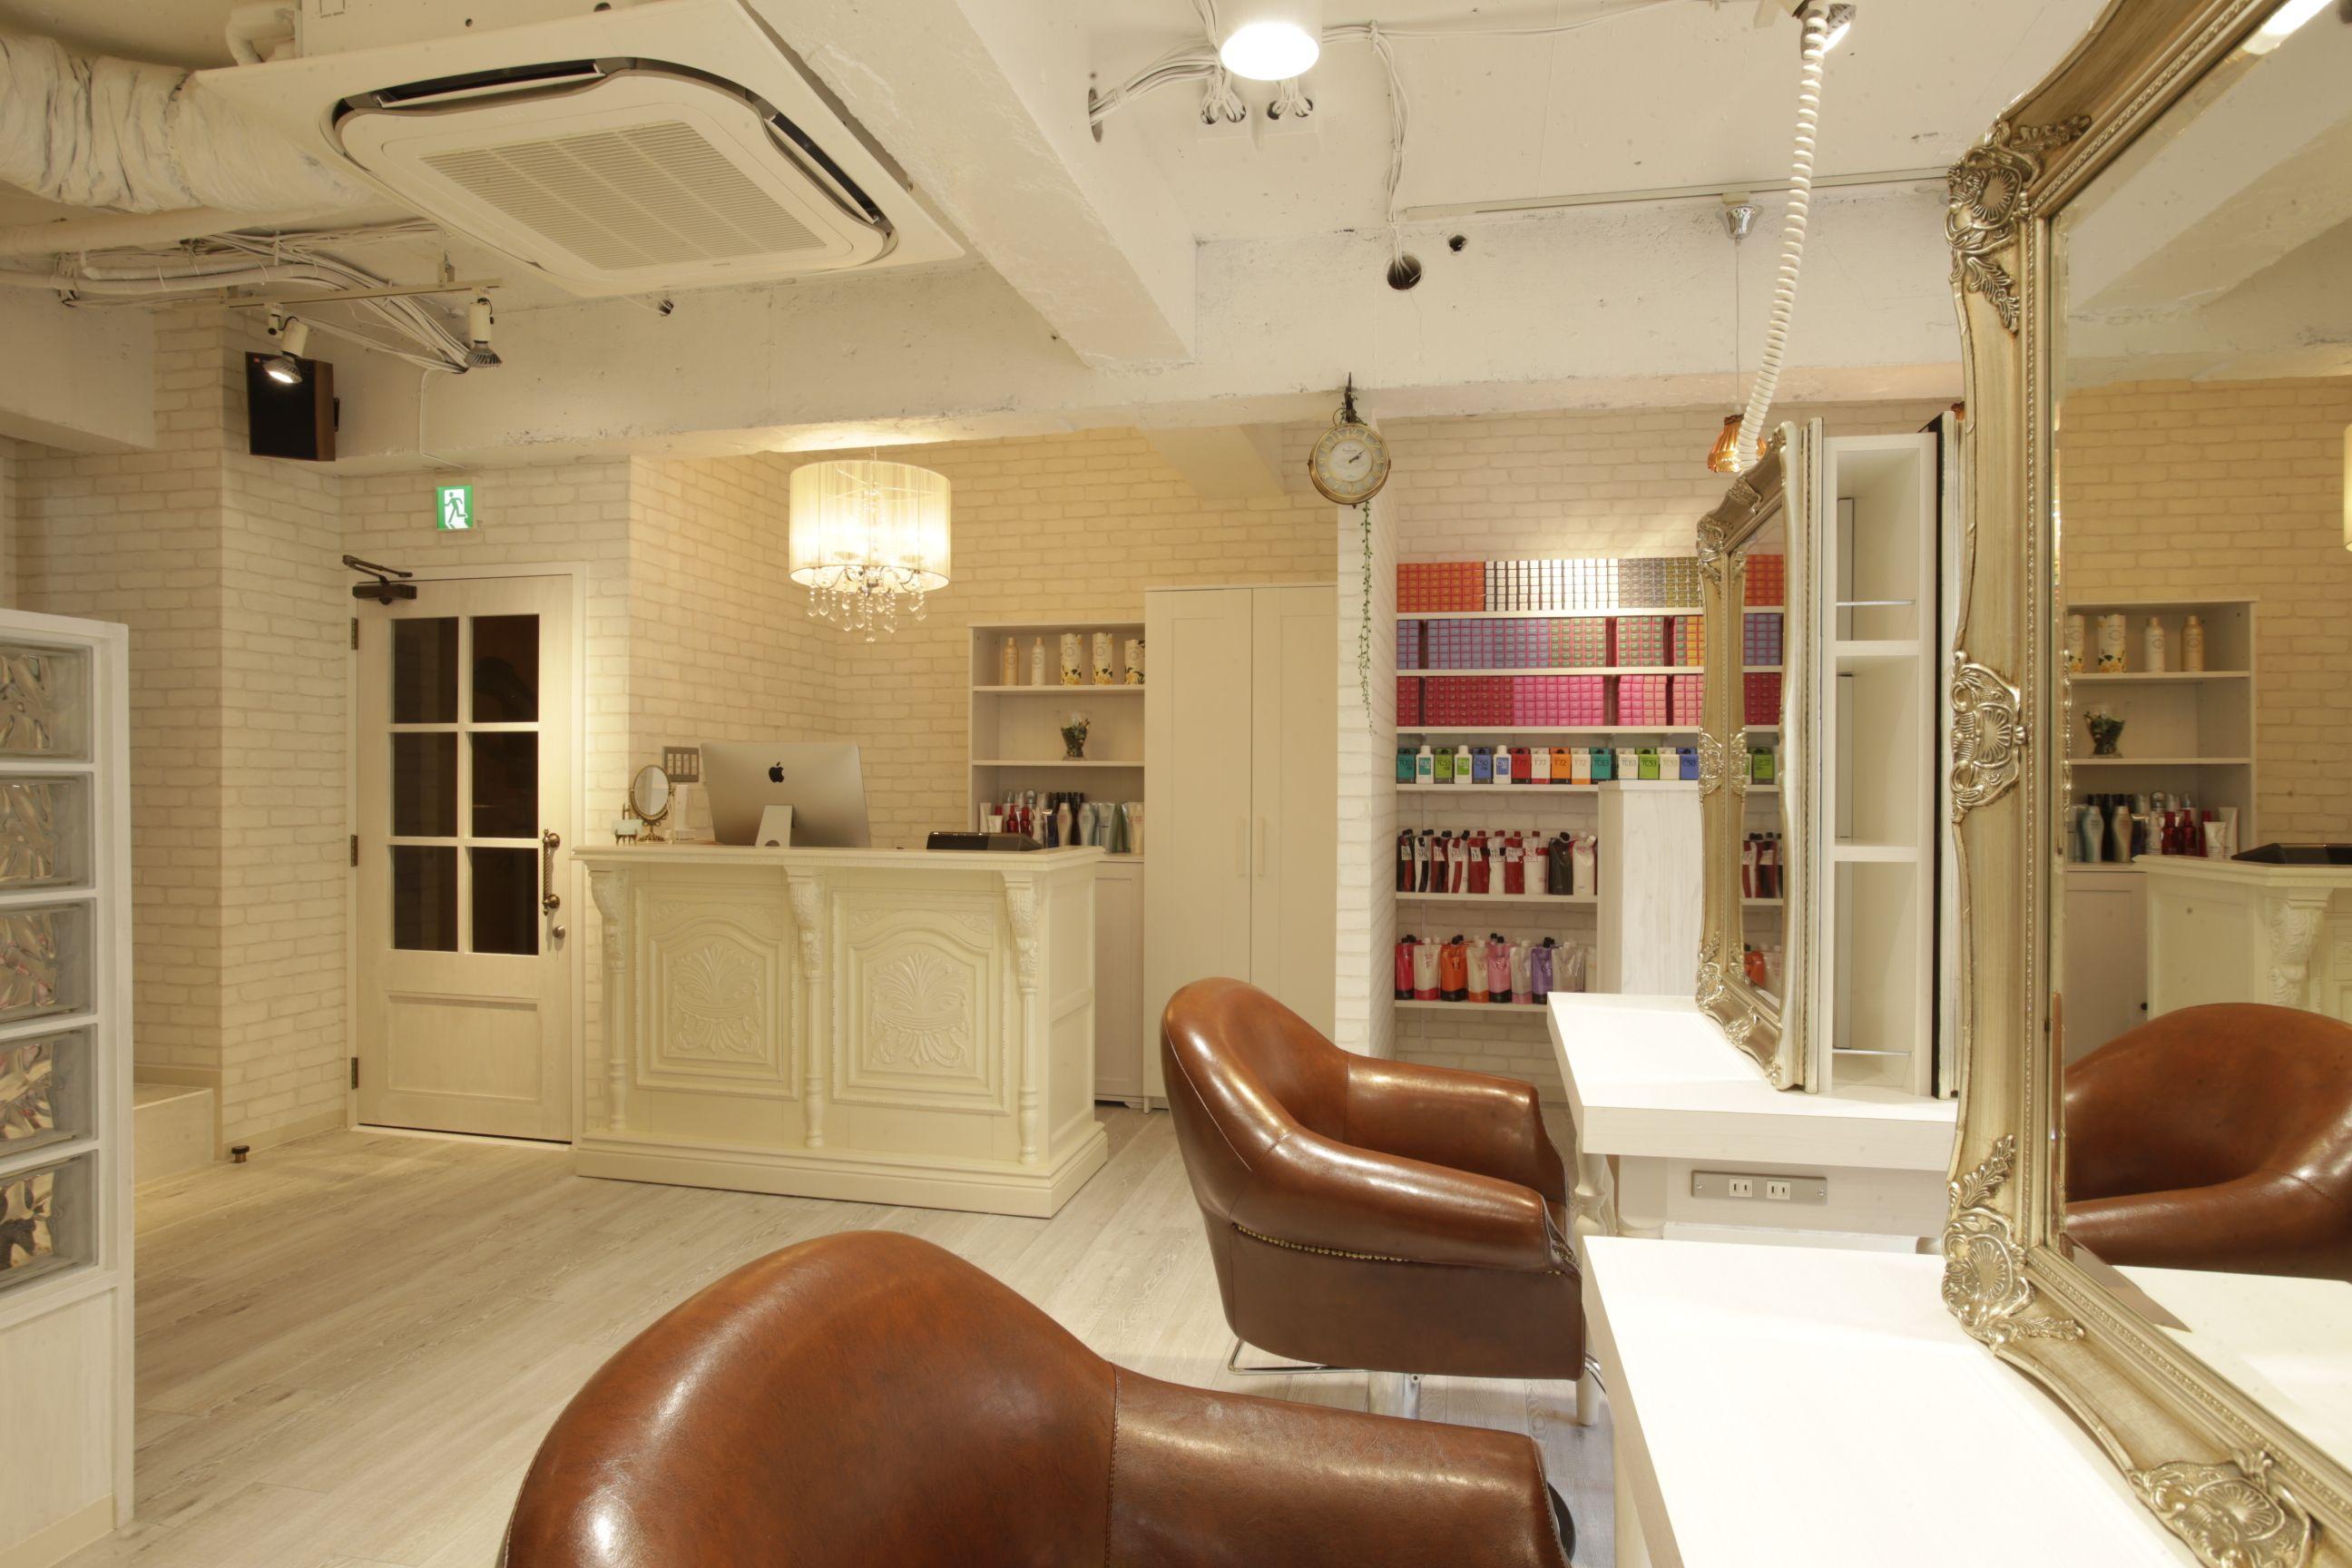 design michael salon pin spa interior photos and for hair g indianapolis